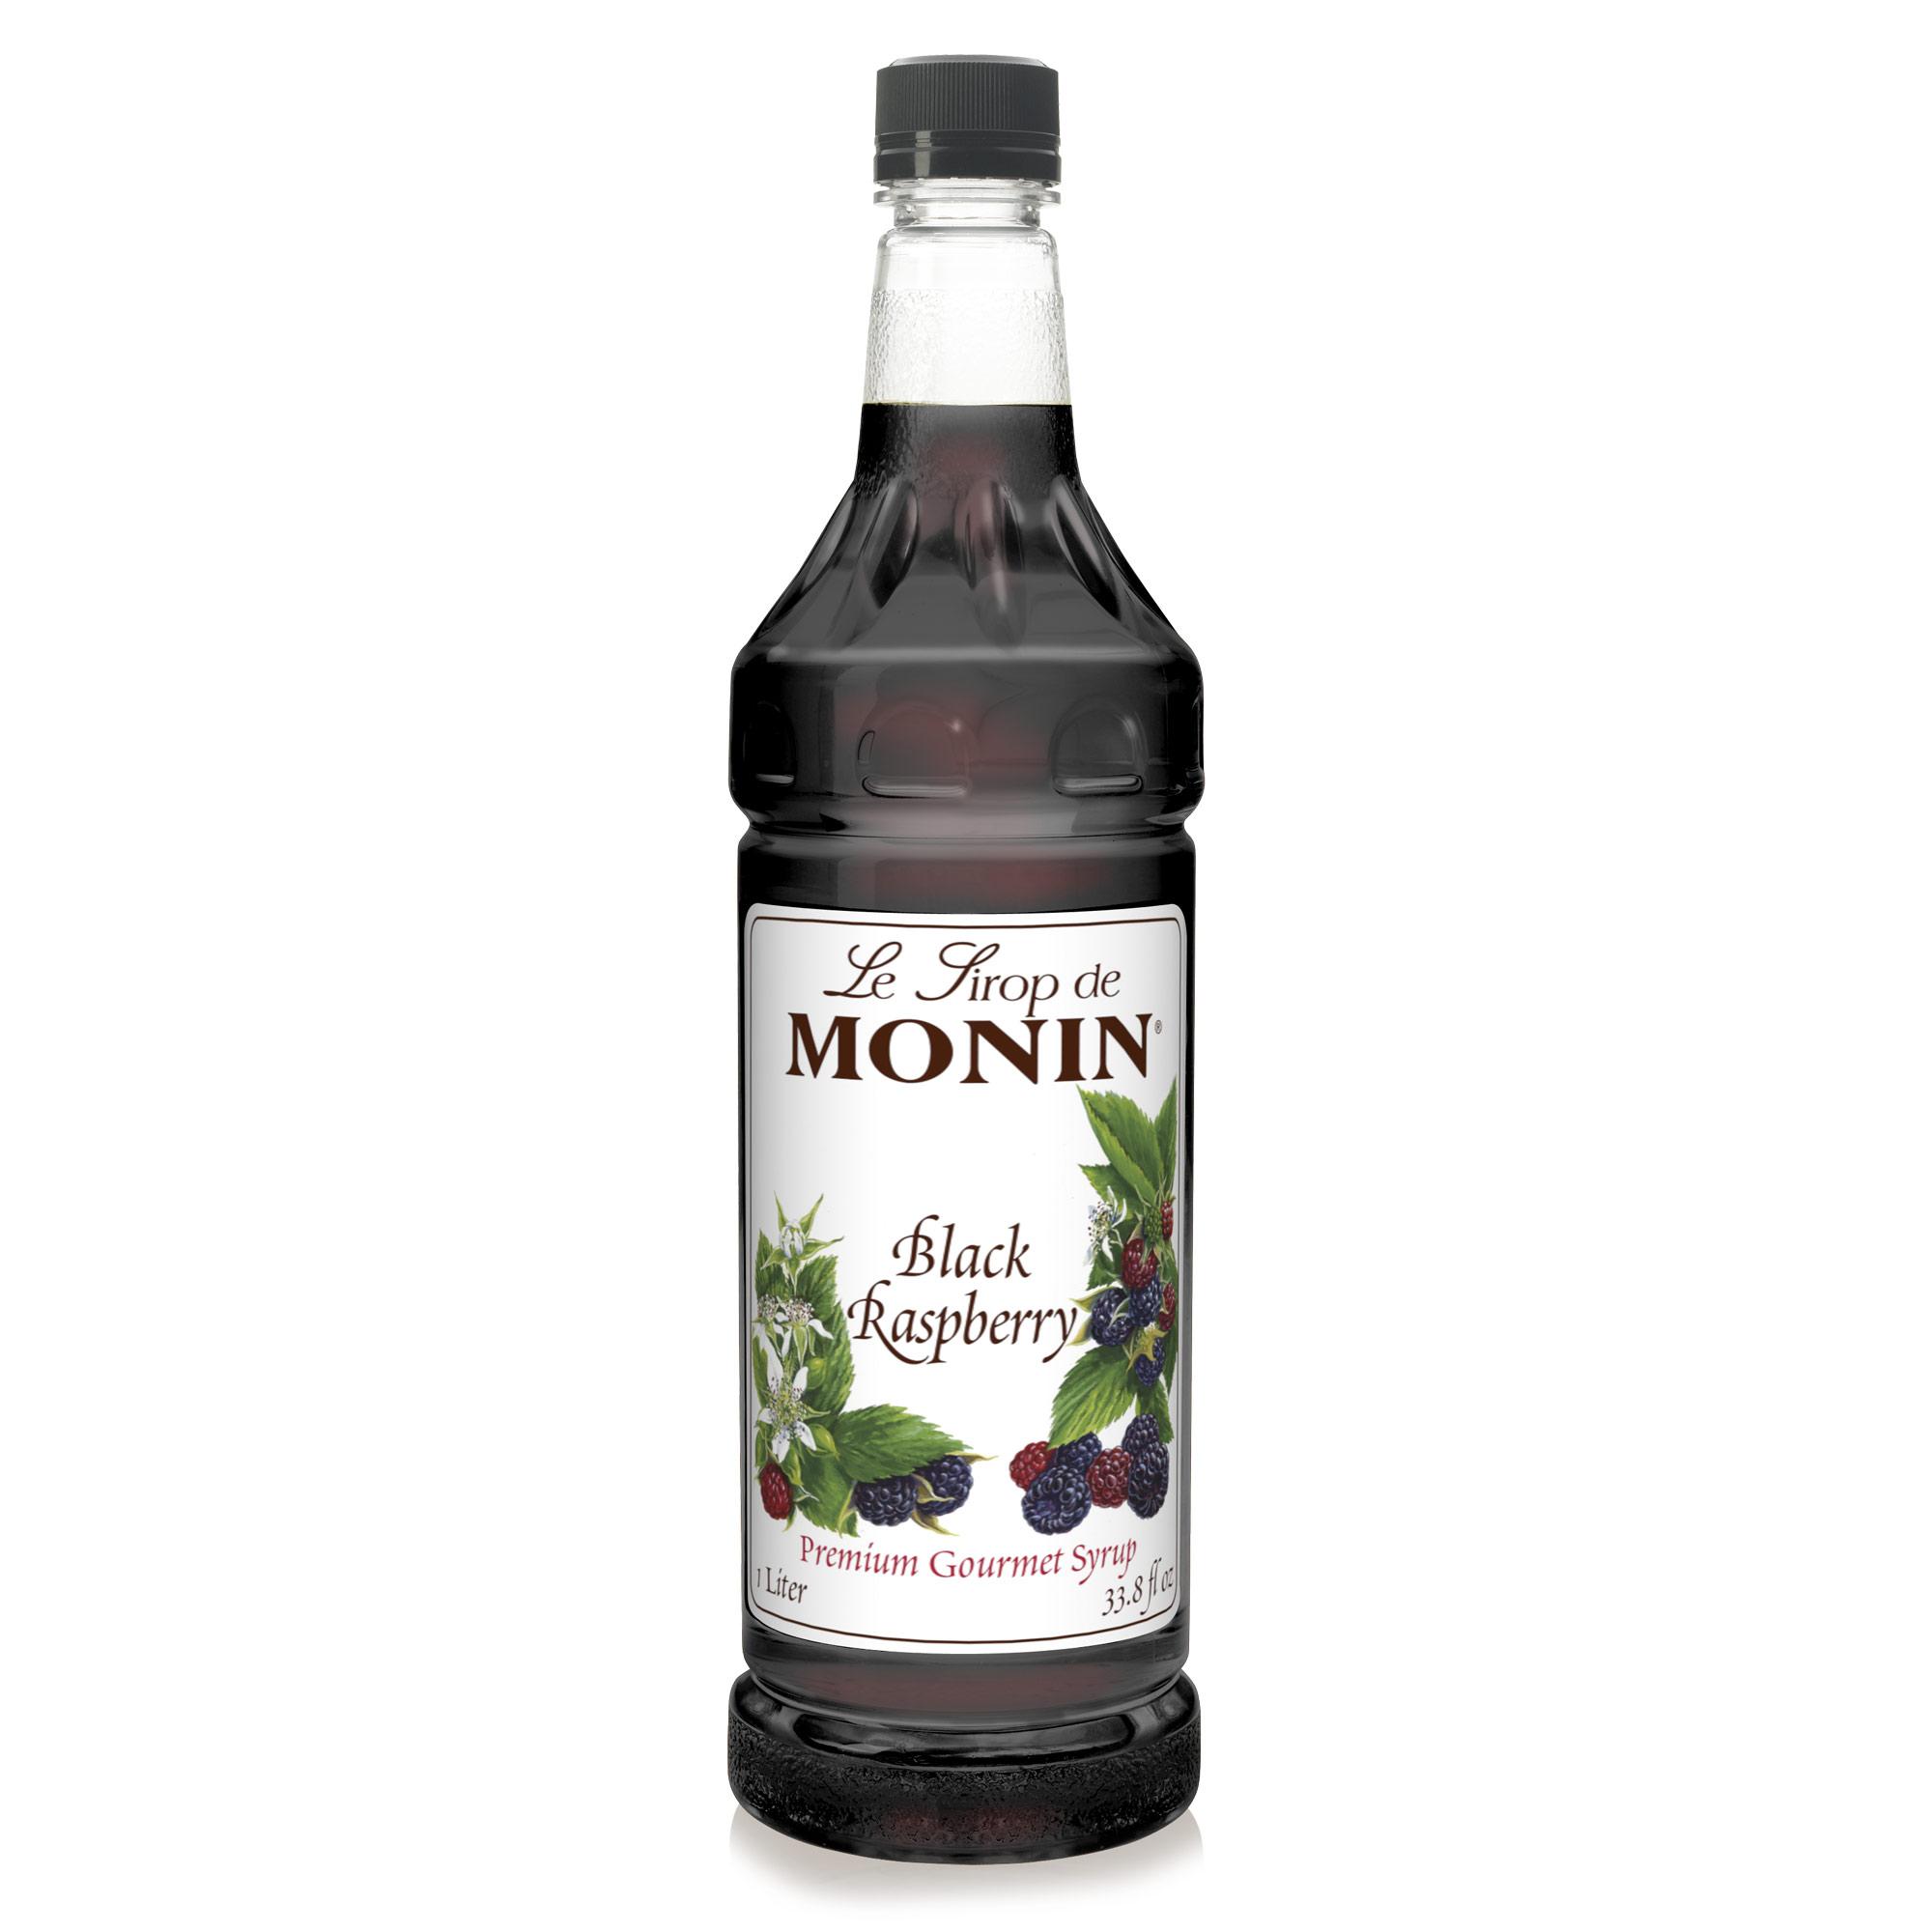 Monin Black Raspberry Syrup 1L